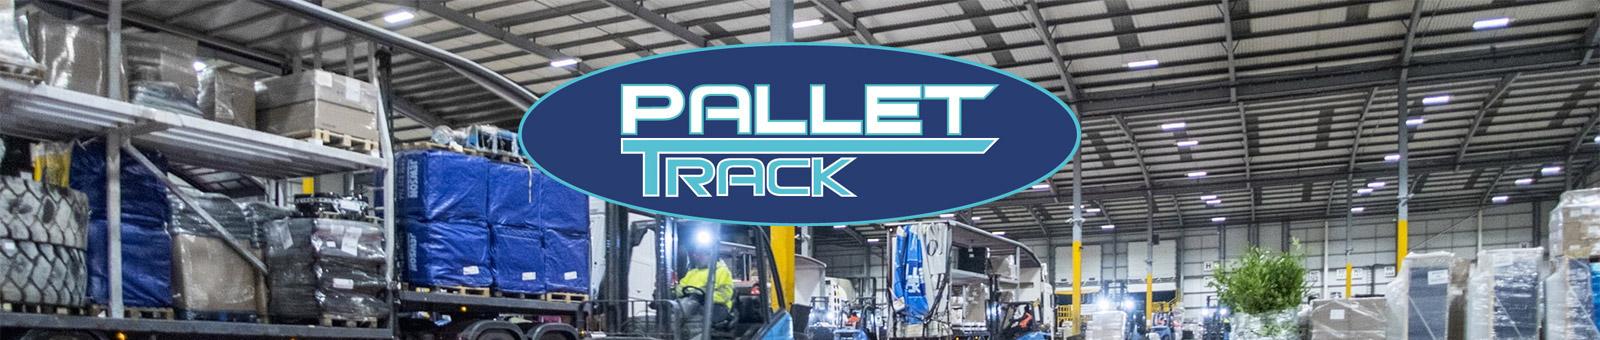 Pallet Track Network